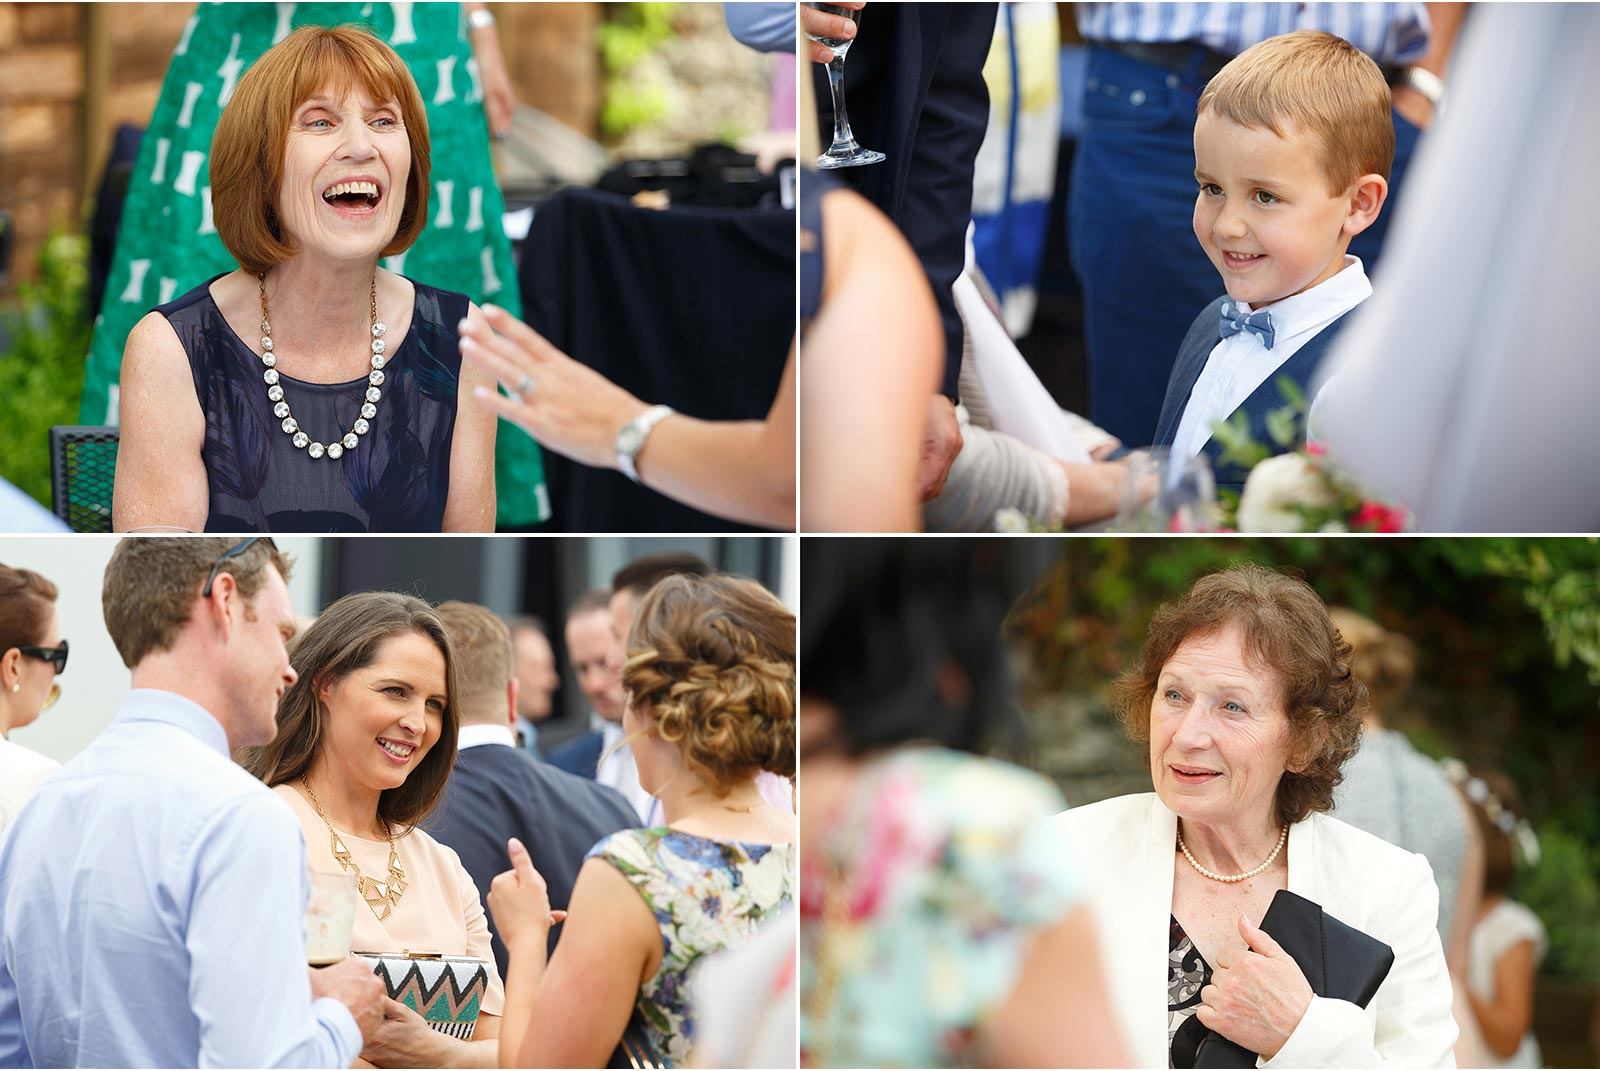 Candid wedding photography Cork, wedding guests